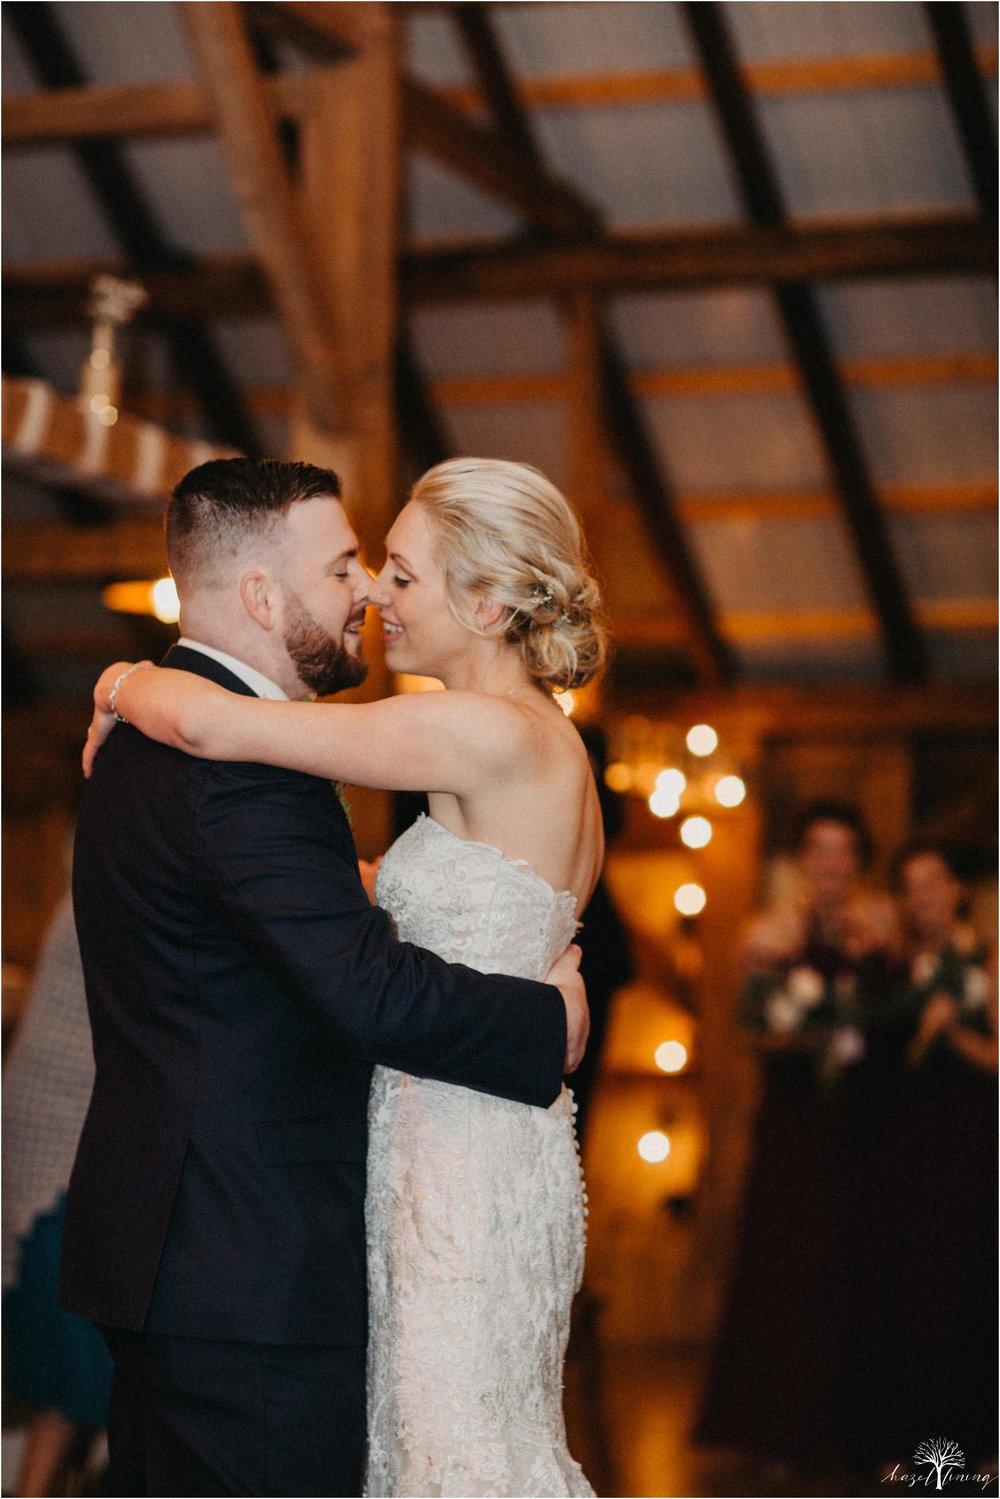 briana-krans-greg-johnston-farm-bakery-and-events-fall-wedding_0147.jpg